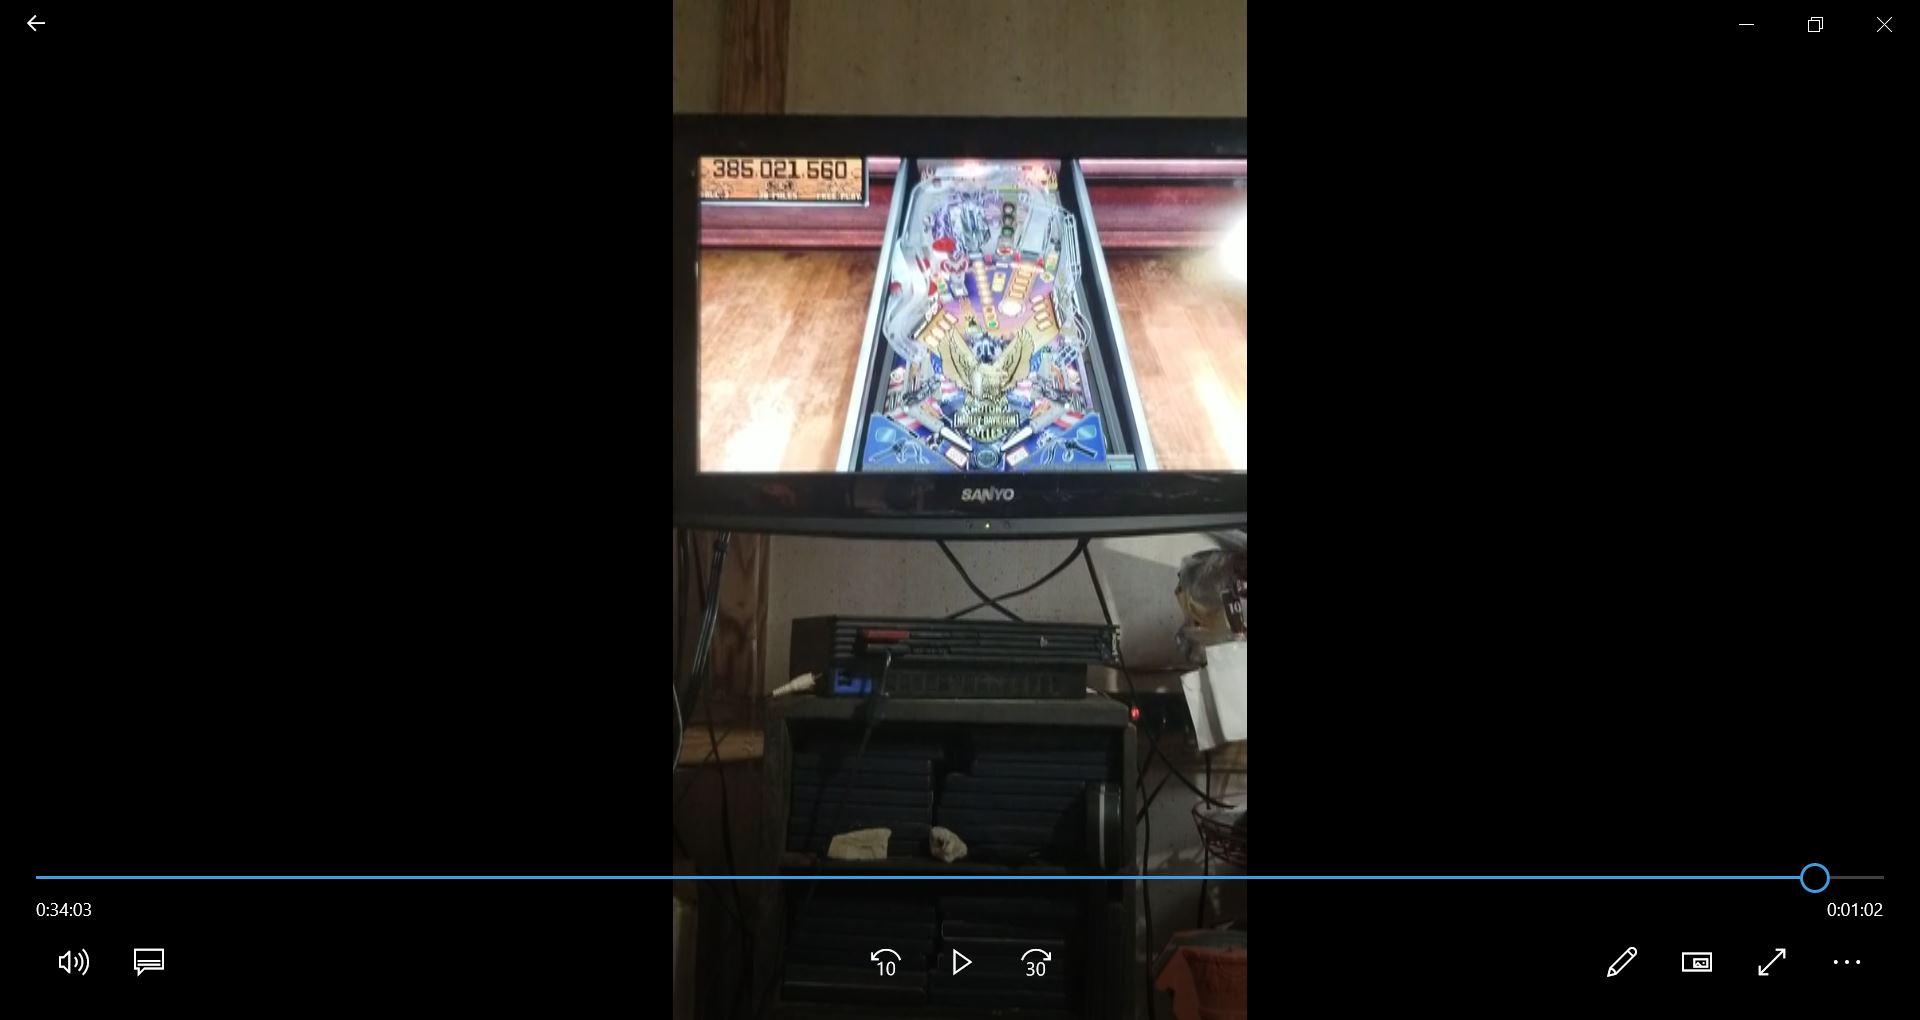 speedy4759123: Pinball Arcade: Harley-Davidson (Playstation 4) 385,021,560 points on 2020-03-20 10:50:05